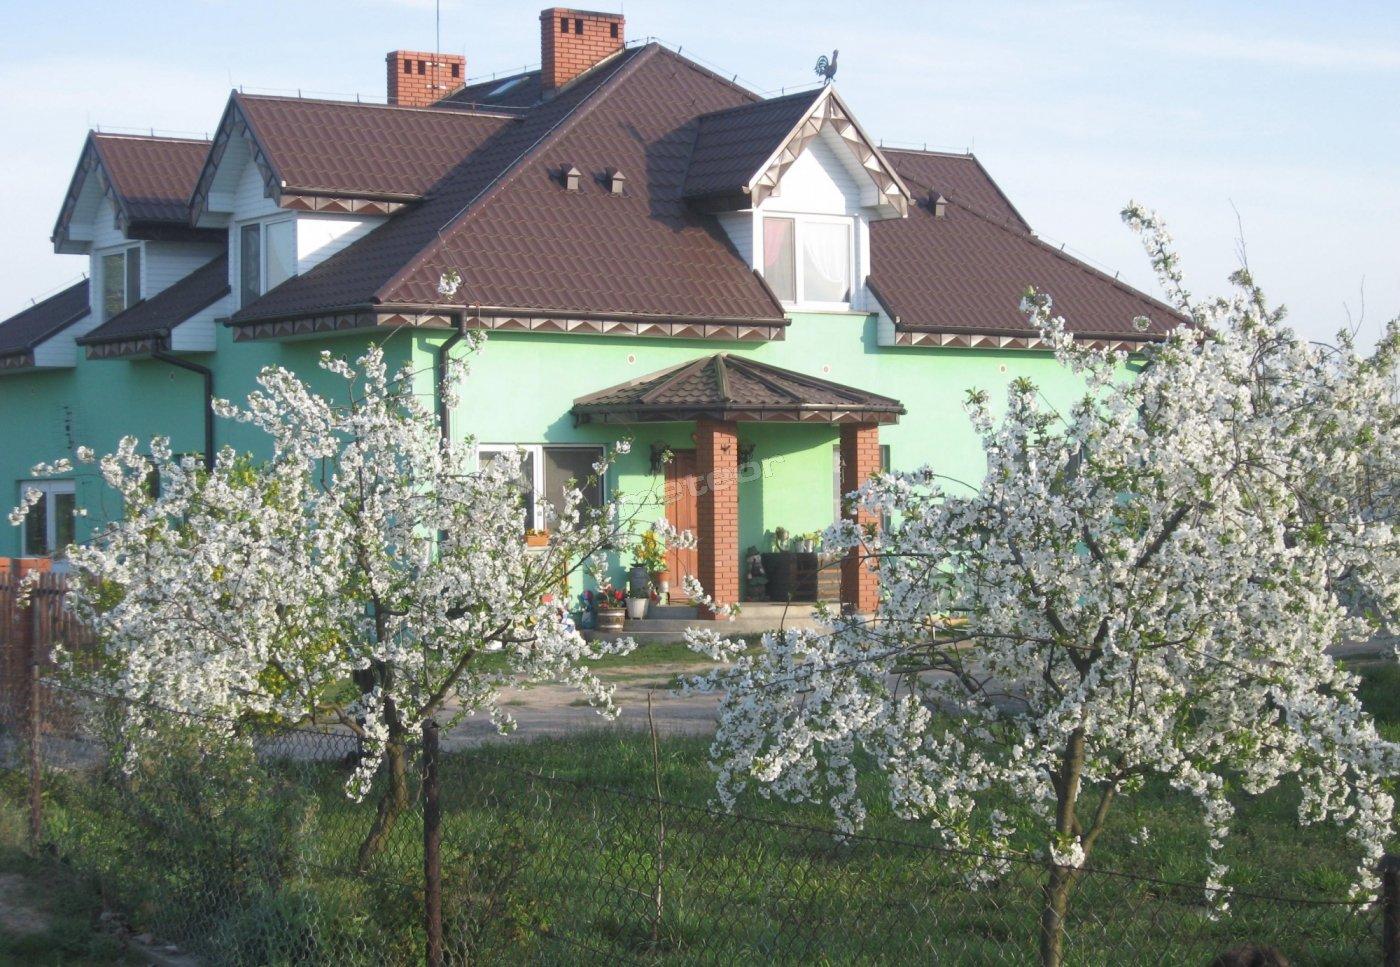 Landtouristik Pod Kogutem